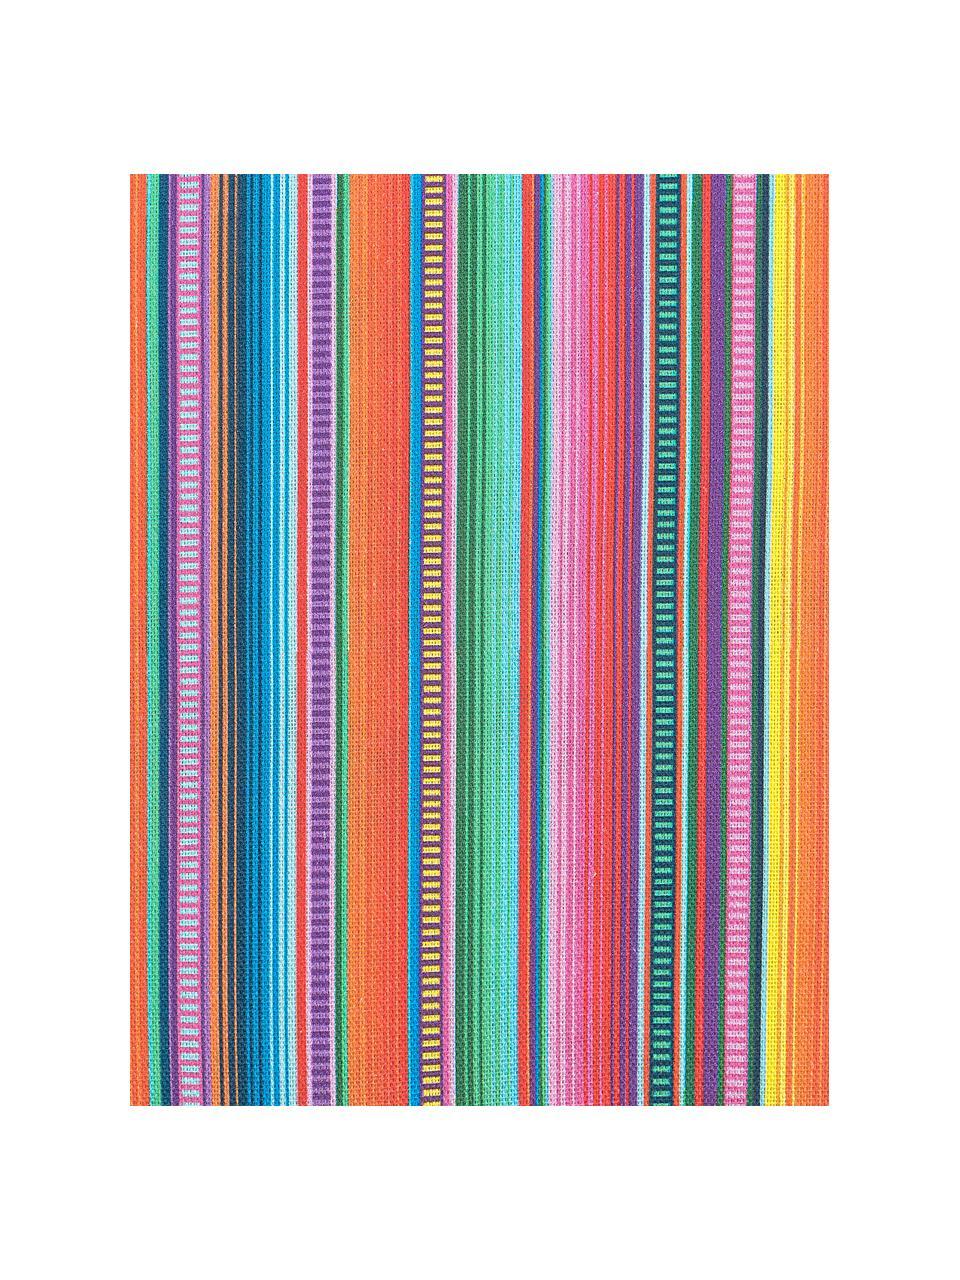 Gestreifte Kissenhülle Mariachi in Bunt, Webart: Halbpanama, Mehrfarbig, 40 x 40 cm